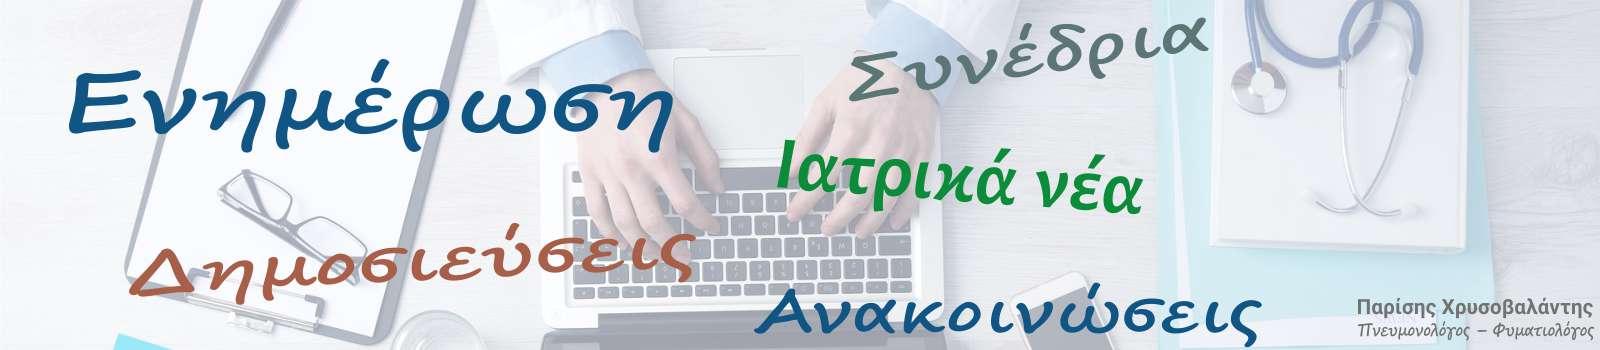 blog-Πνευμονολόγος-Φυματιολόγος-Θεσσαλονίκη